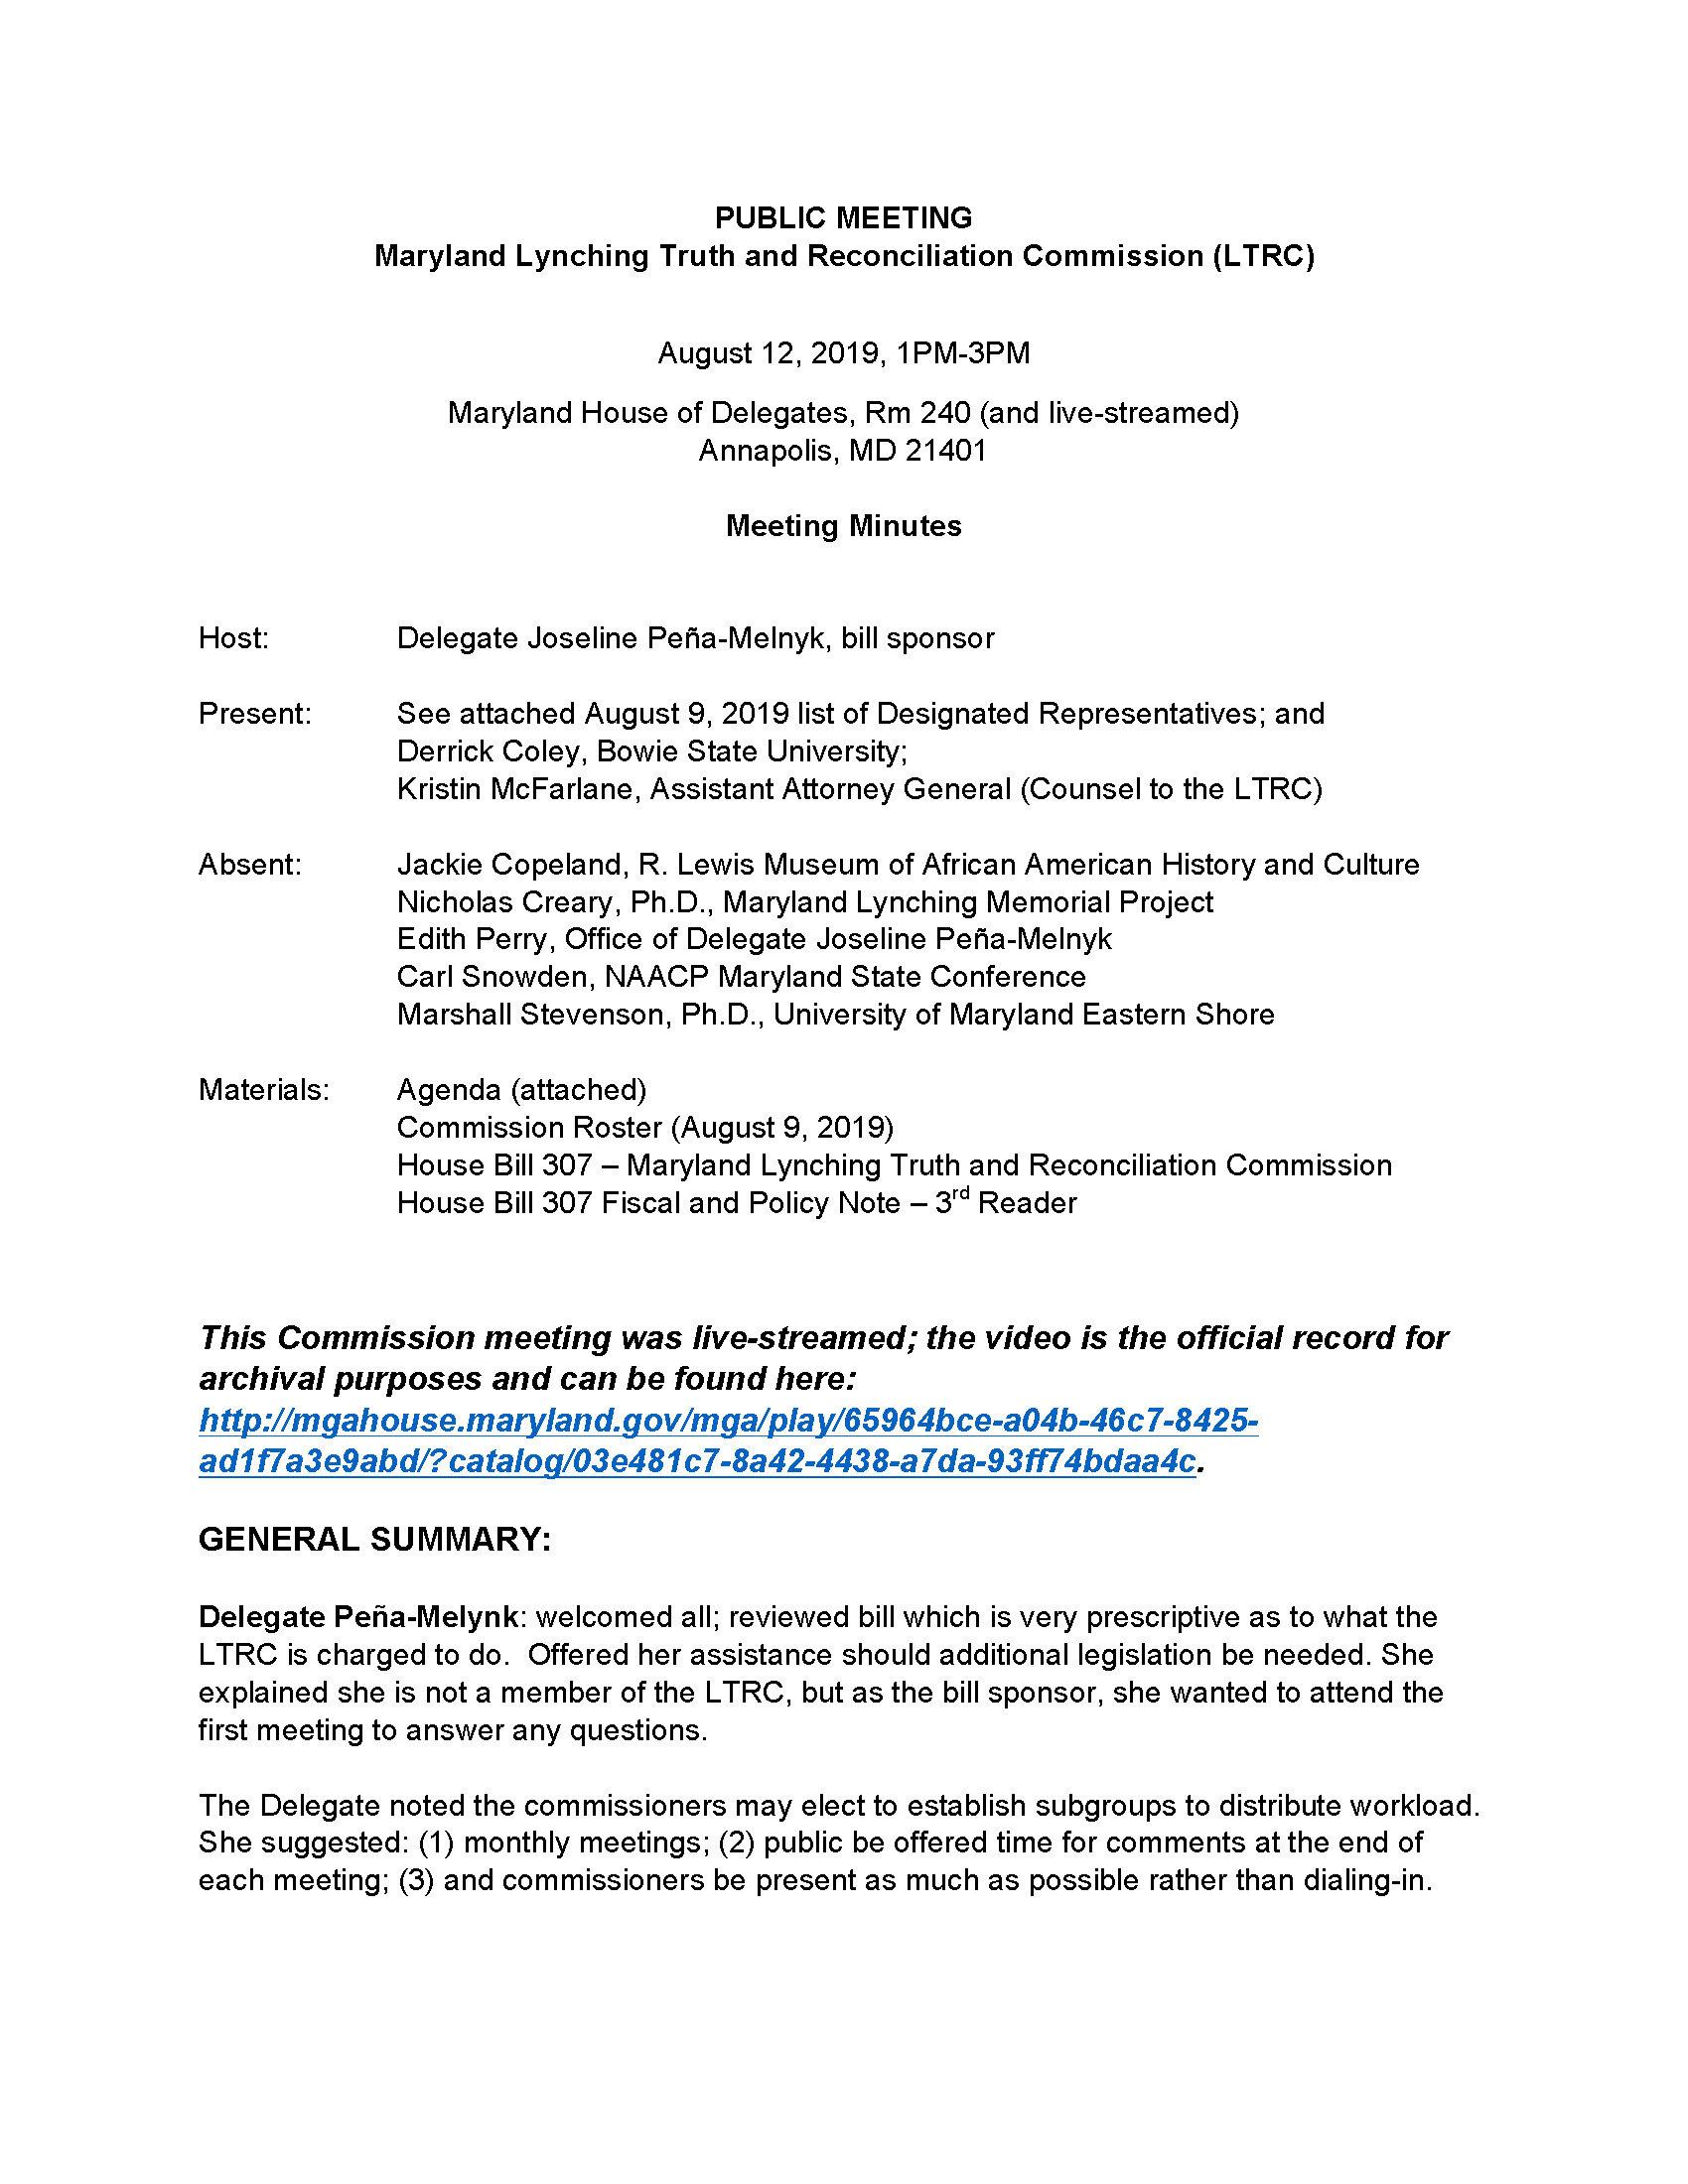 Meeting Minutes 8.07.19 FINAL_Page_1.jpg